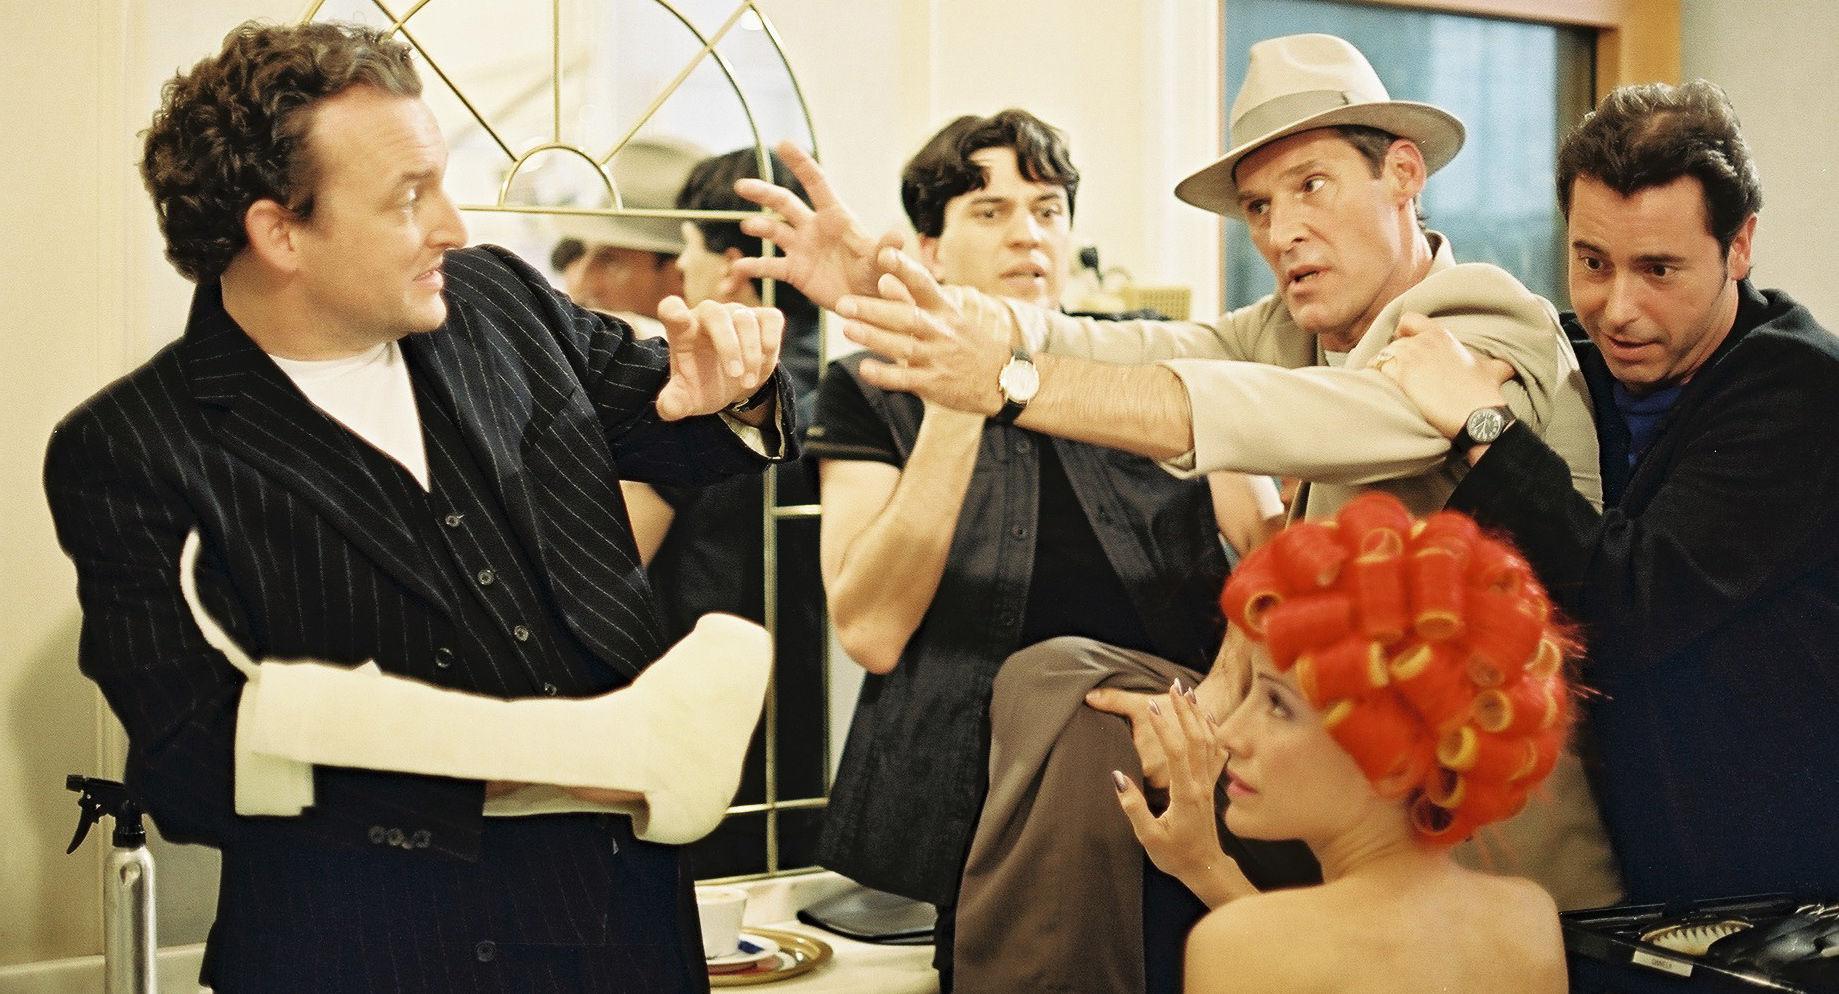 Marco Rima (Eddy), Sandra Pires (Maggie Thompson), Ben Cross (David Greenbaum), Nicholas Newman (Tony)